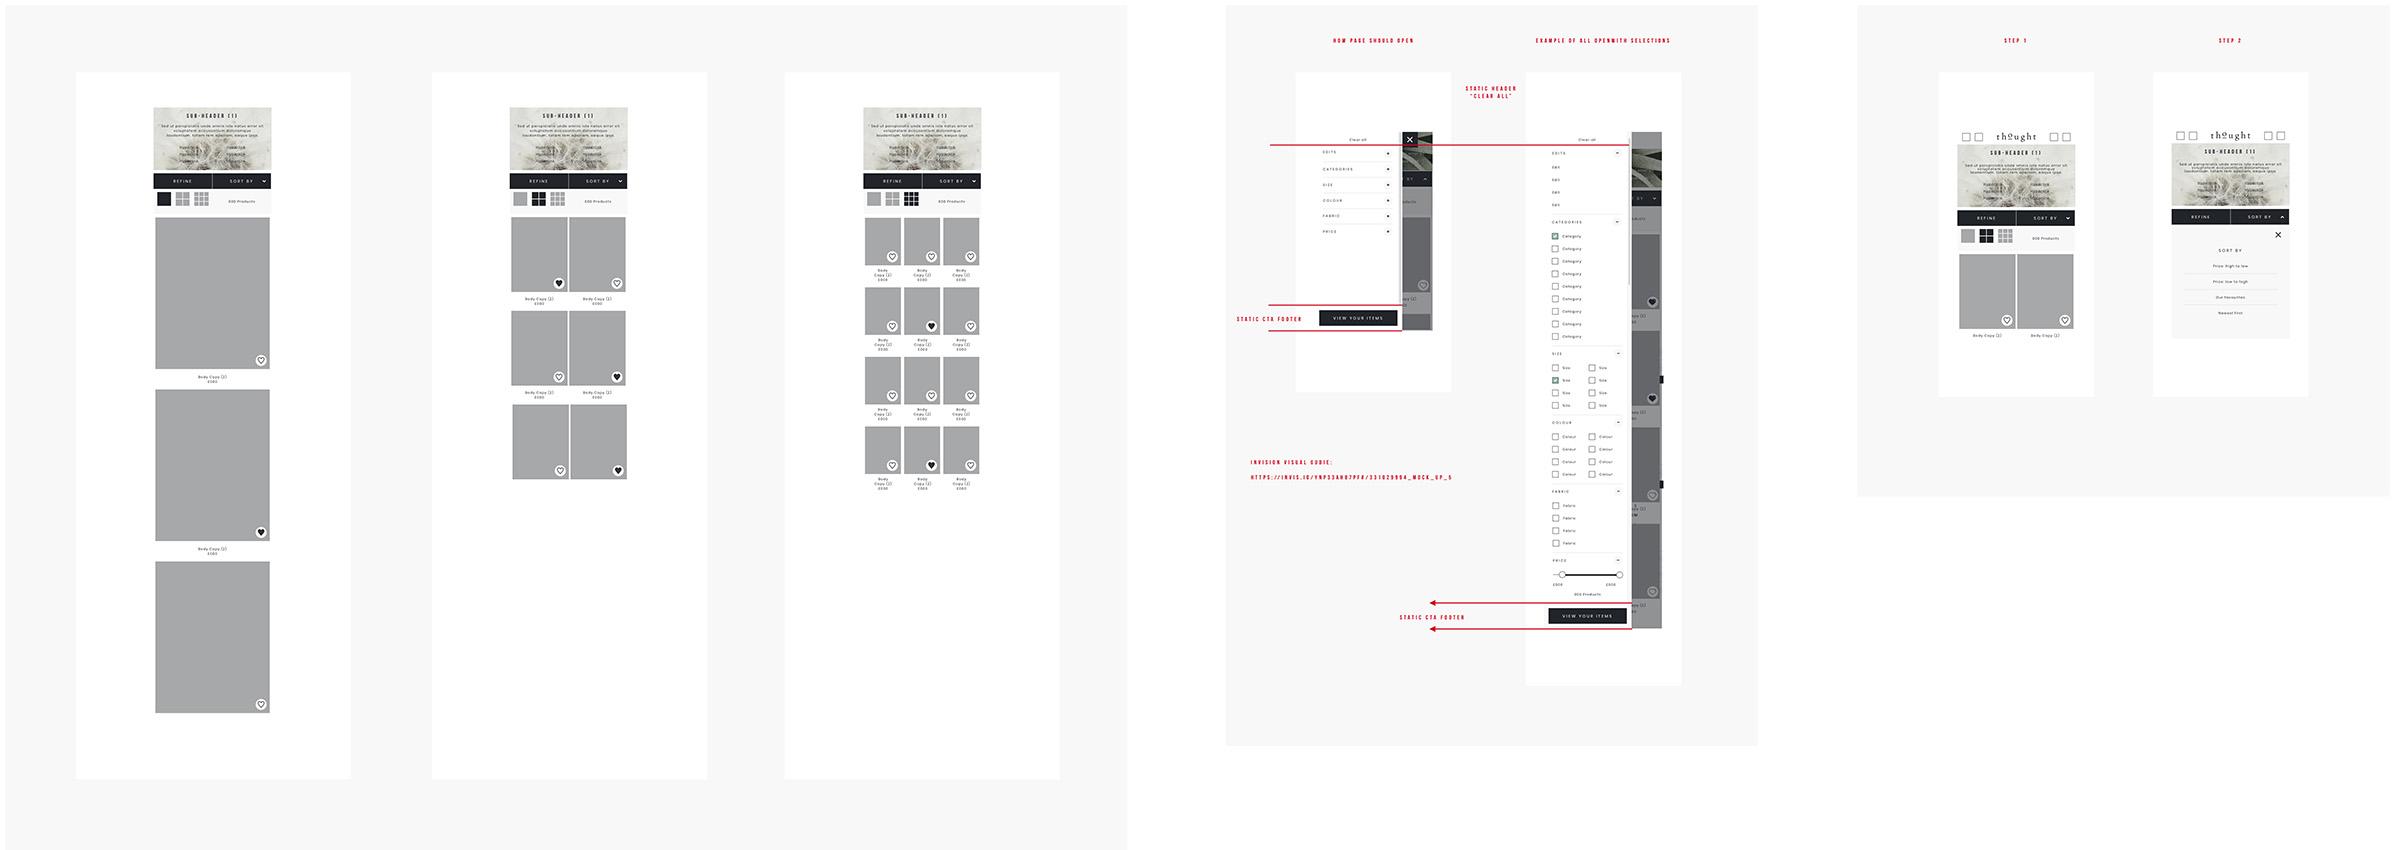 lauren-grace-design-ui-digital-brand-designer-sustainable-thought-fashion-product-page.jpg